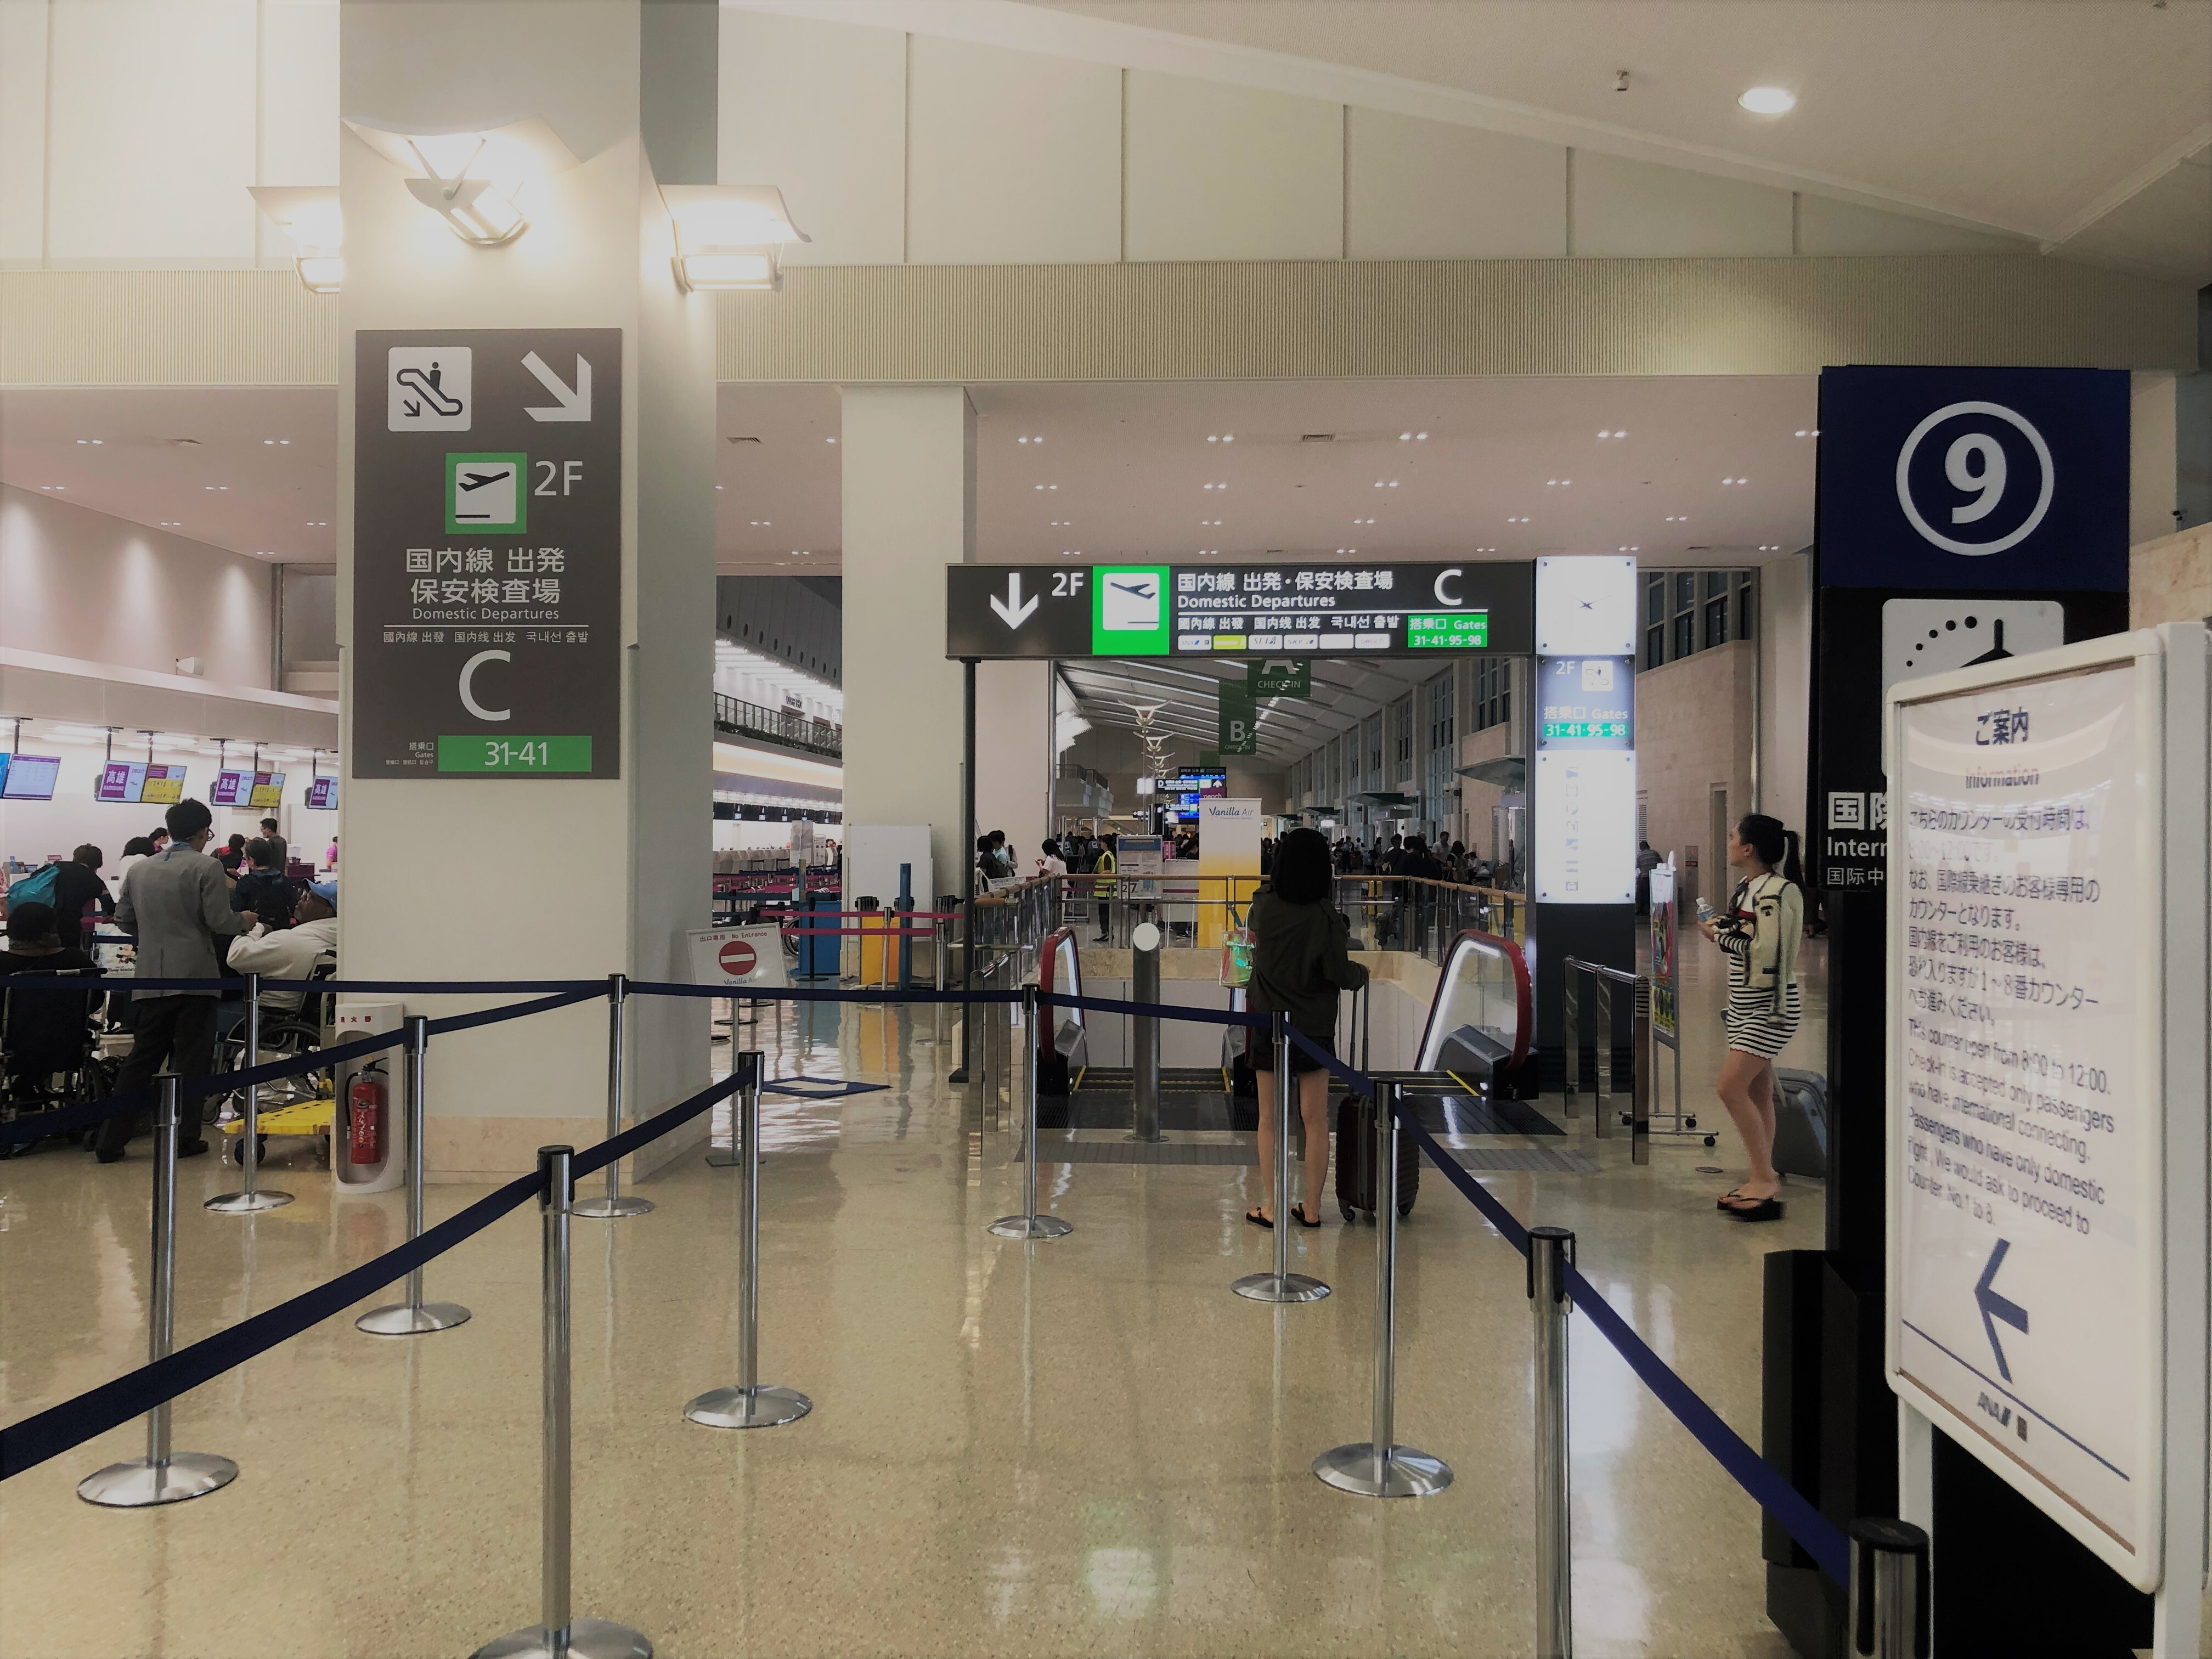 空港内の写真